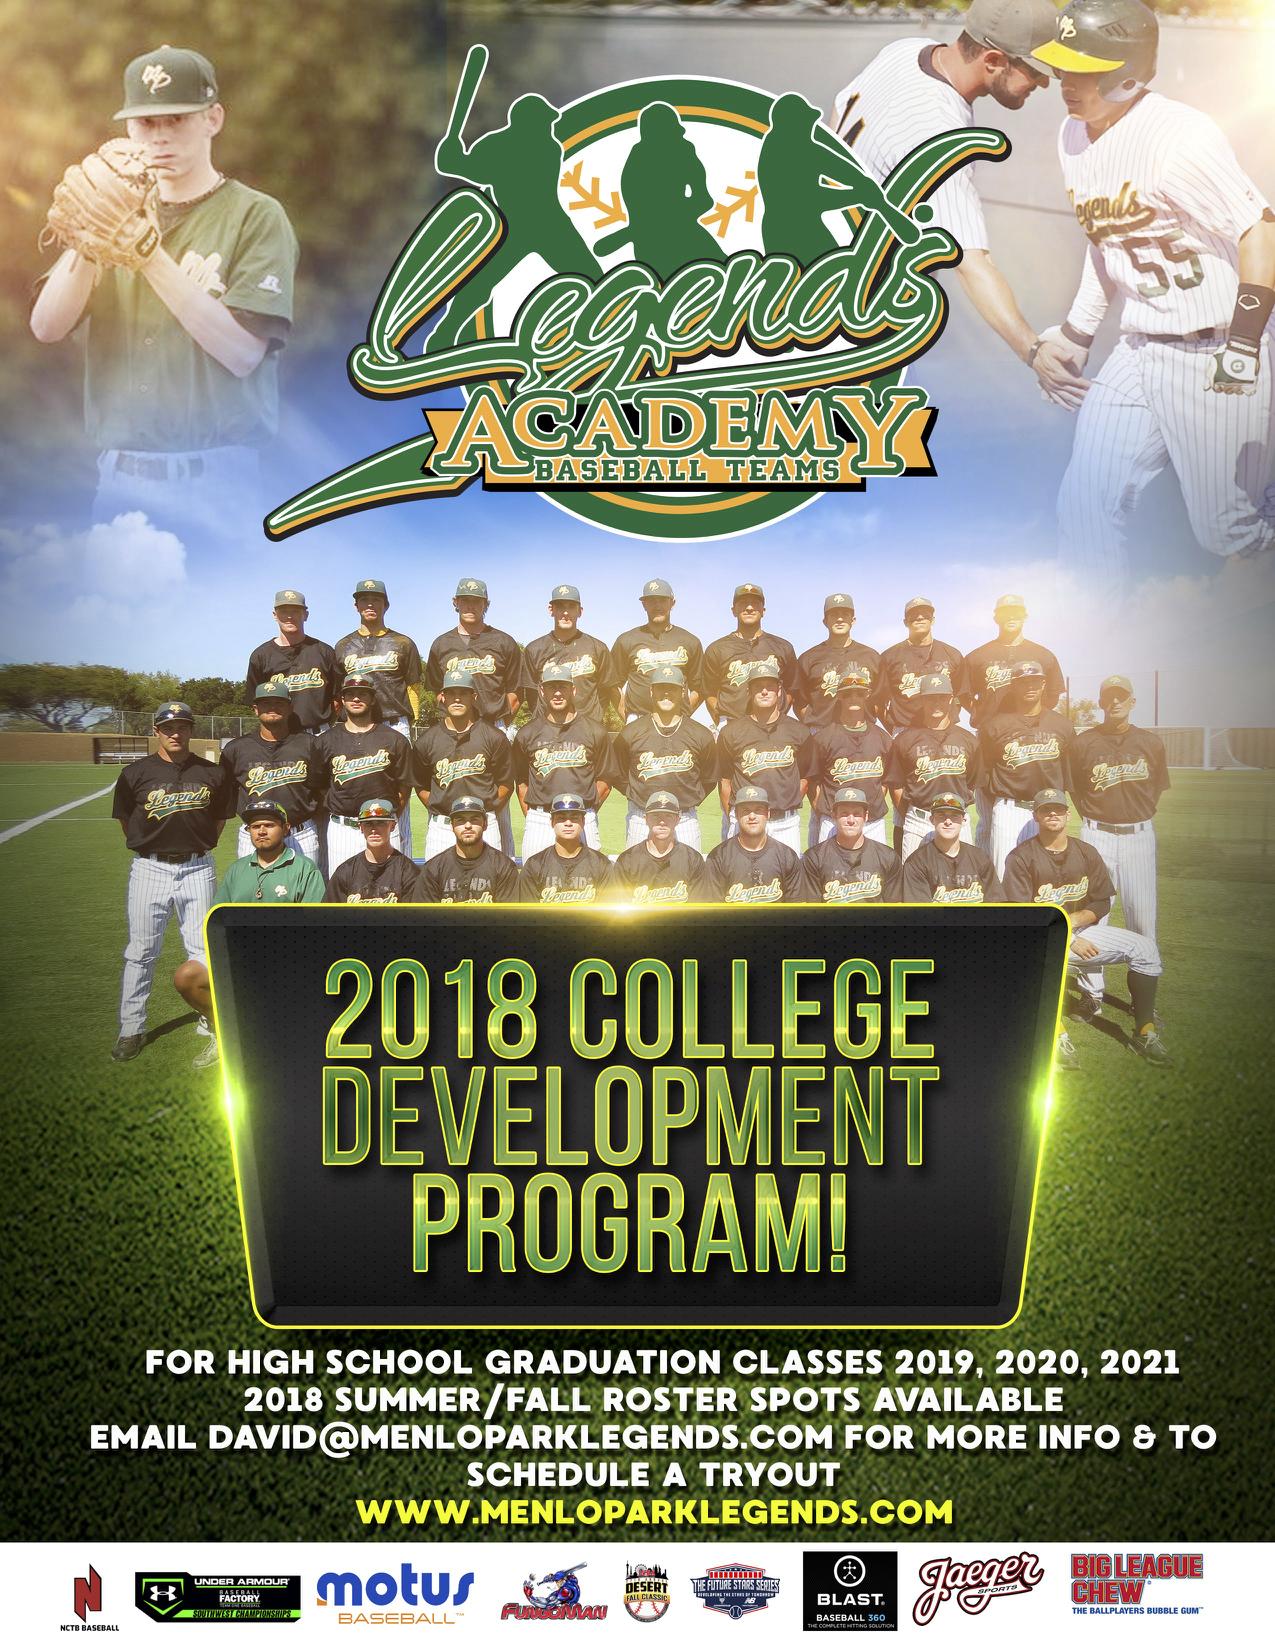 youth baseball camp flyer aildoc productoseb co